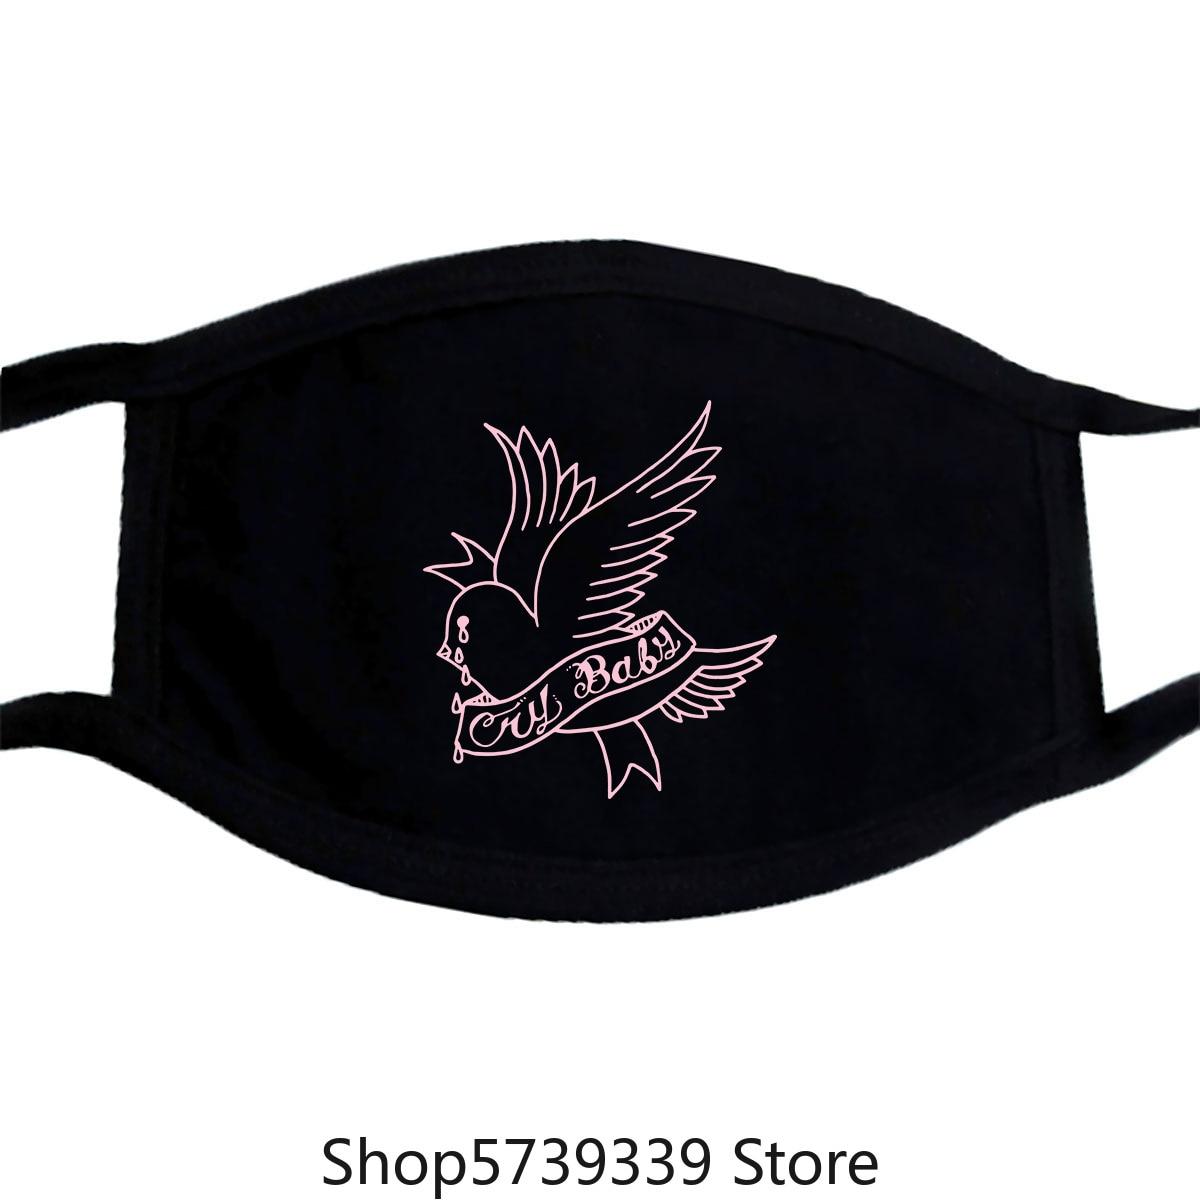 Lil Peep Dove,Crybaby Tattoo Mask Size Large Washable Reusable Mask For Unisex Black